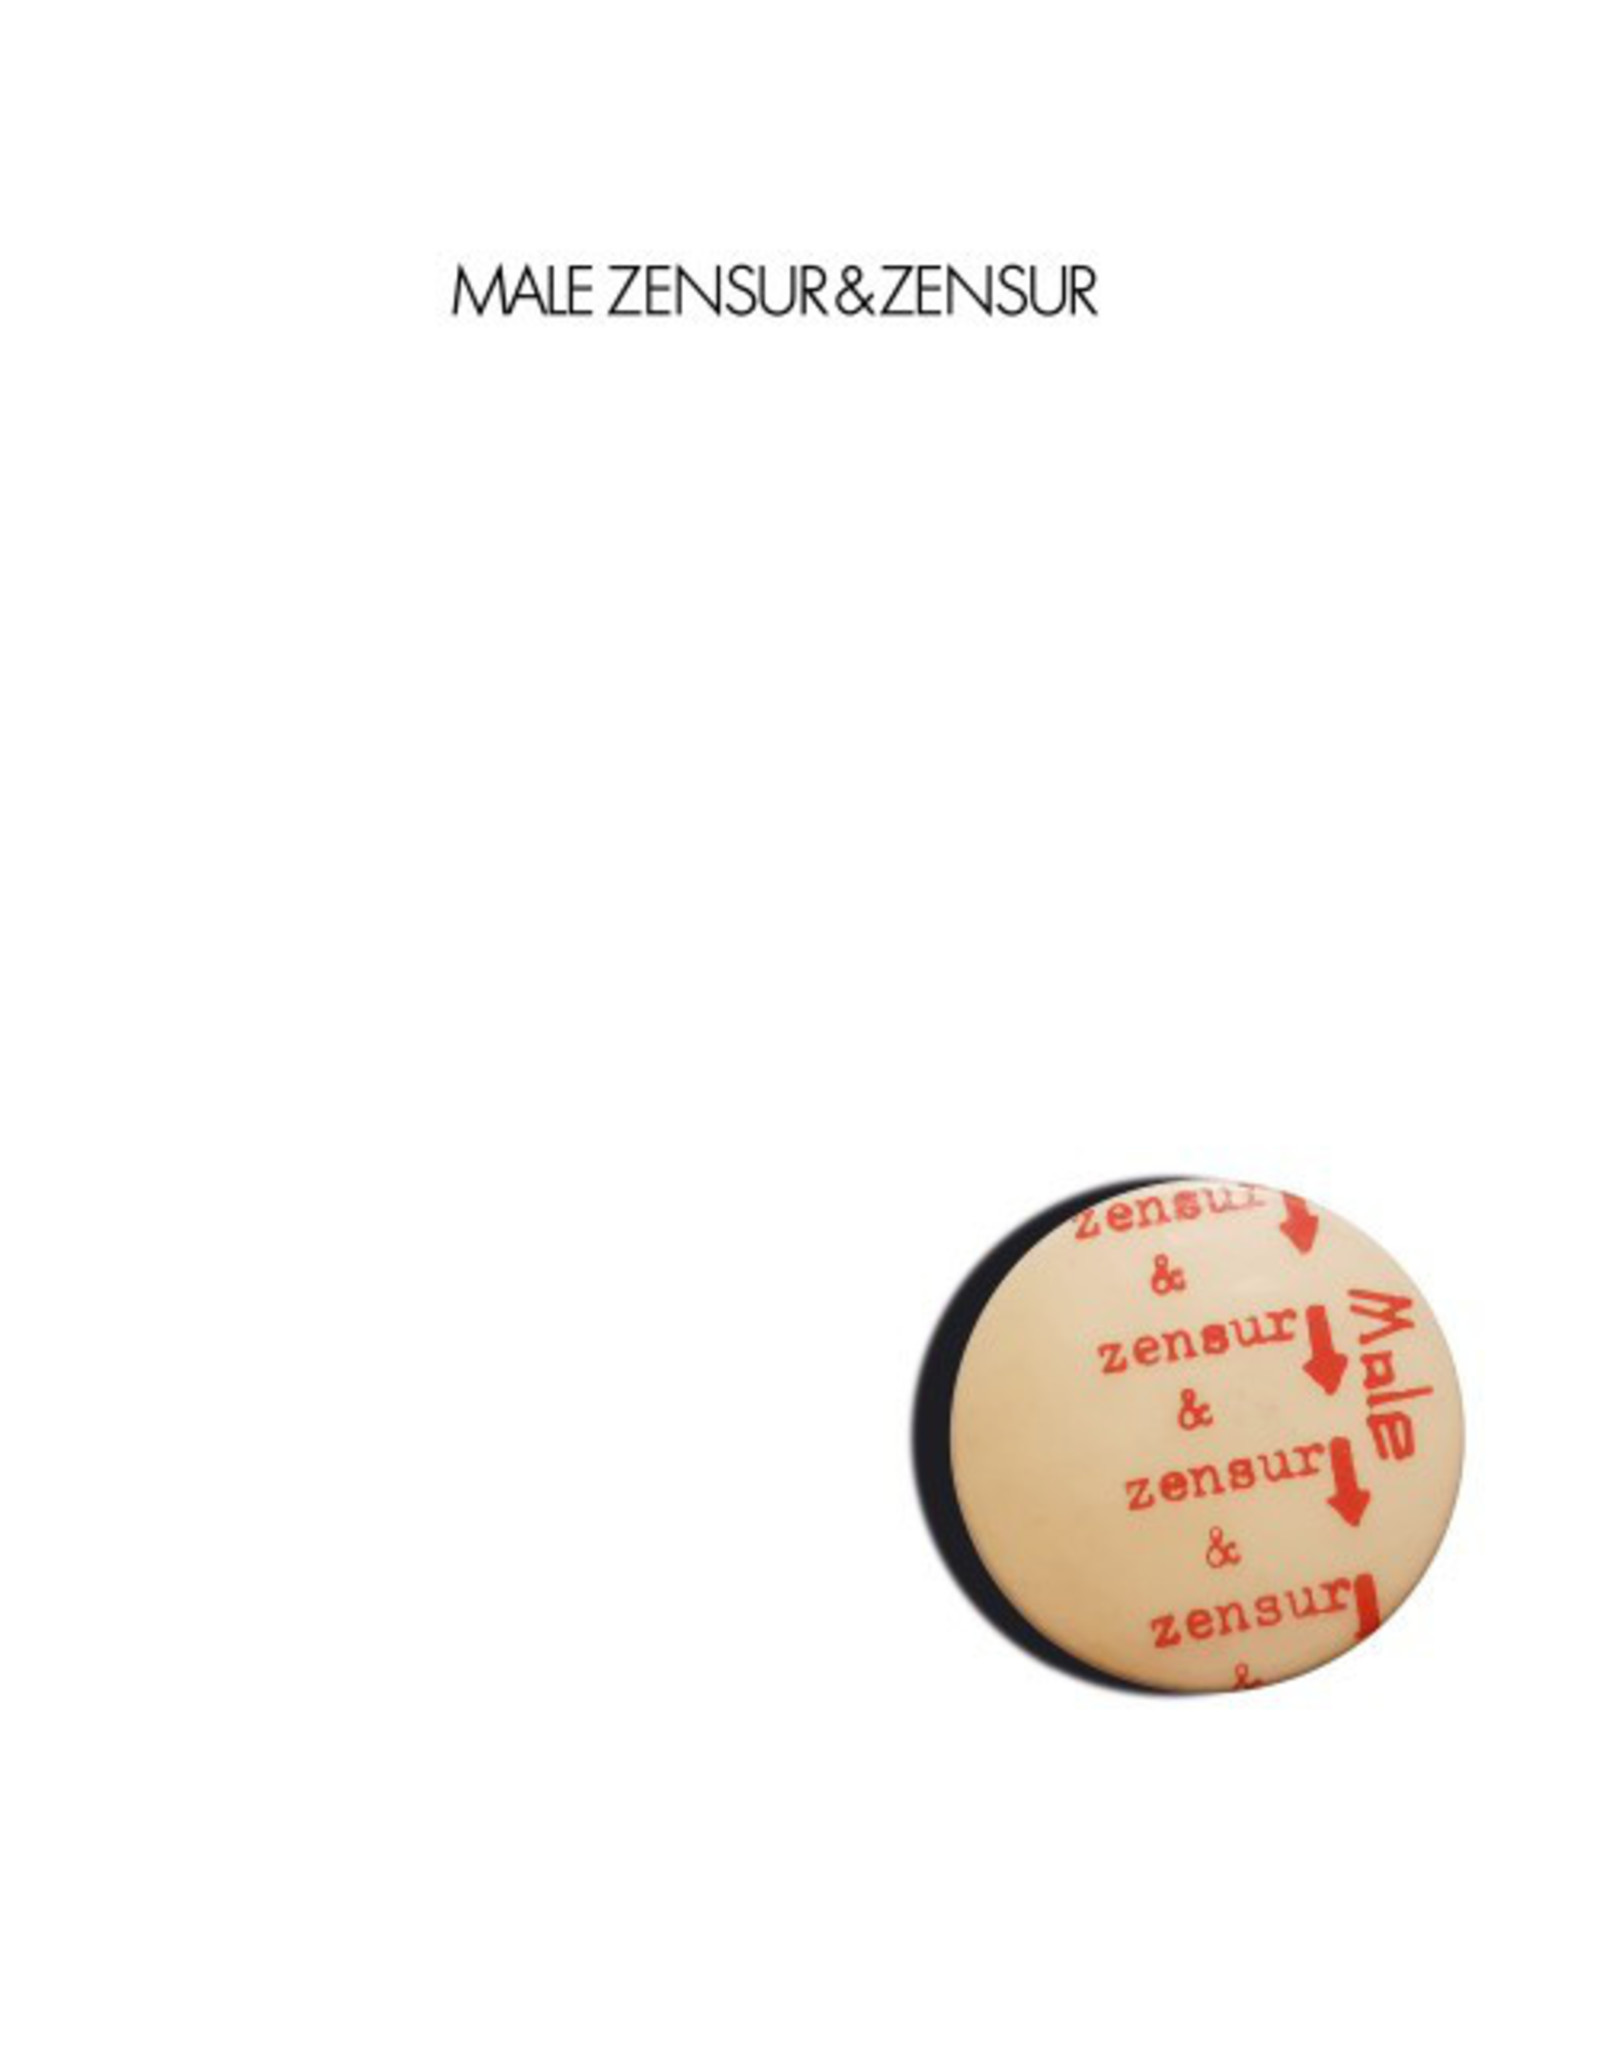 New Vinyl Male - Zensur & Zensur 2LP